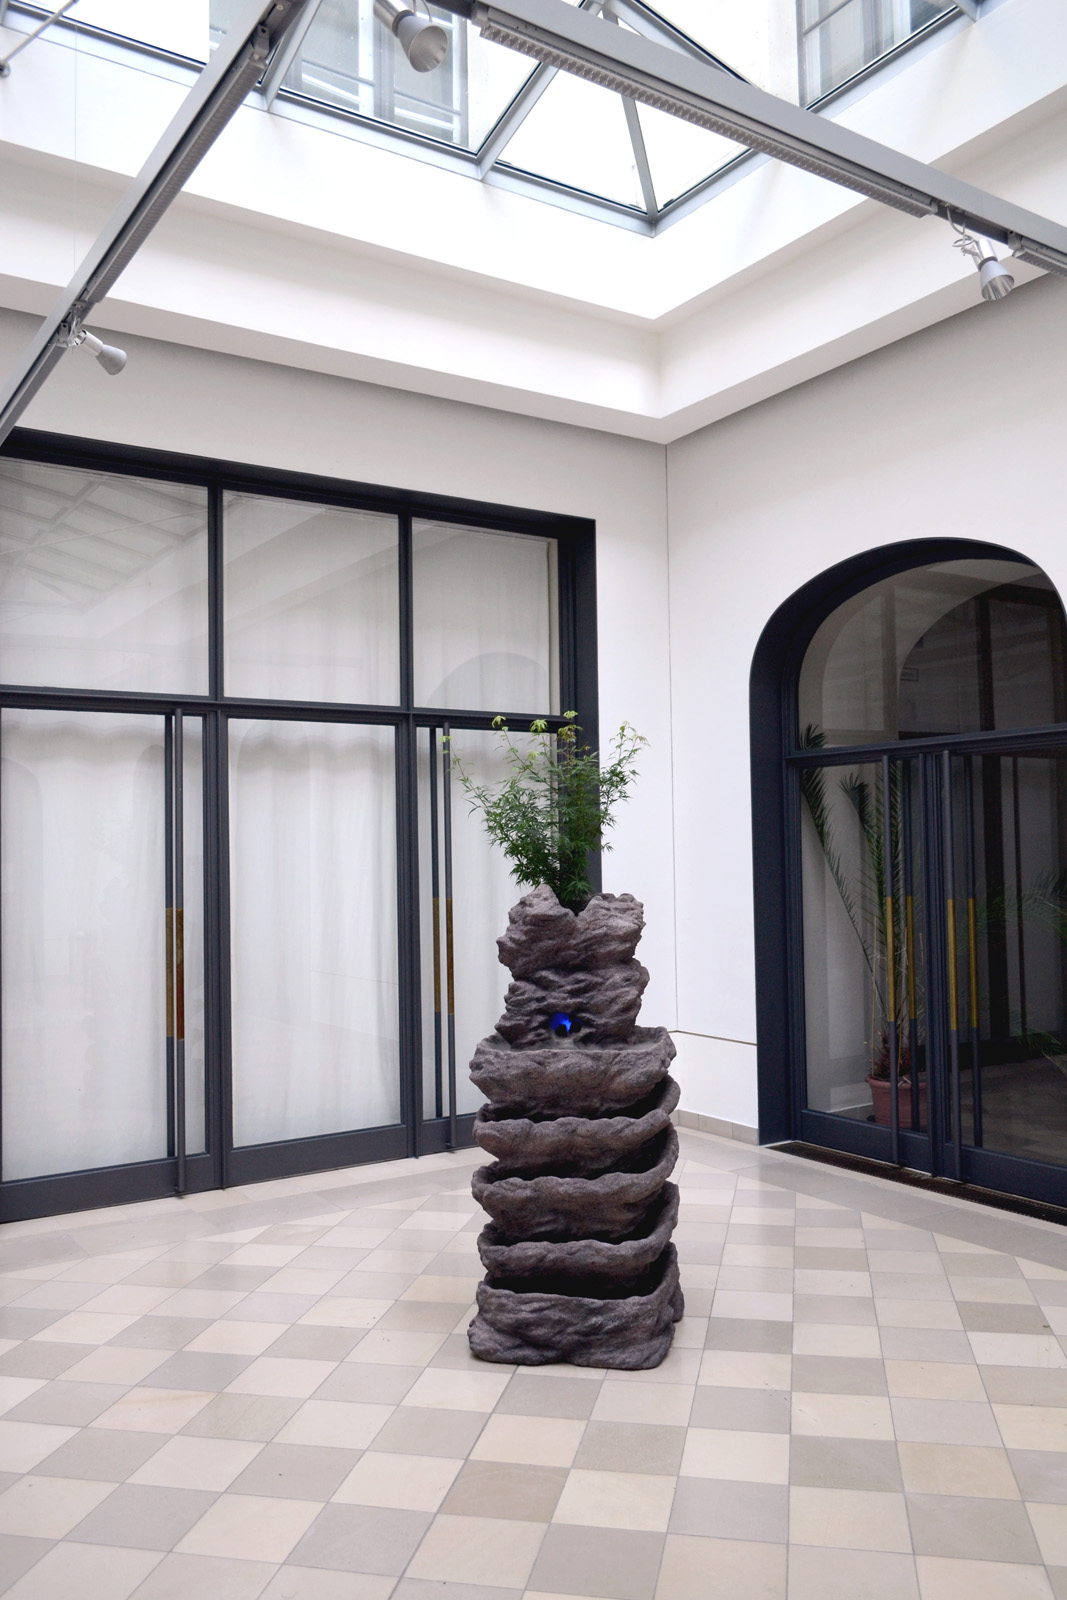 Michel Aniol Skulptur Occiriental Lounge Kleine Humboldt Galerie Berlin Kunst